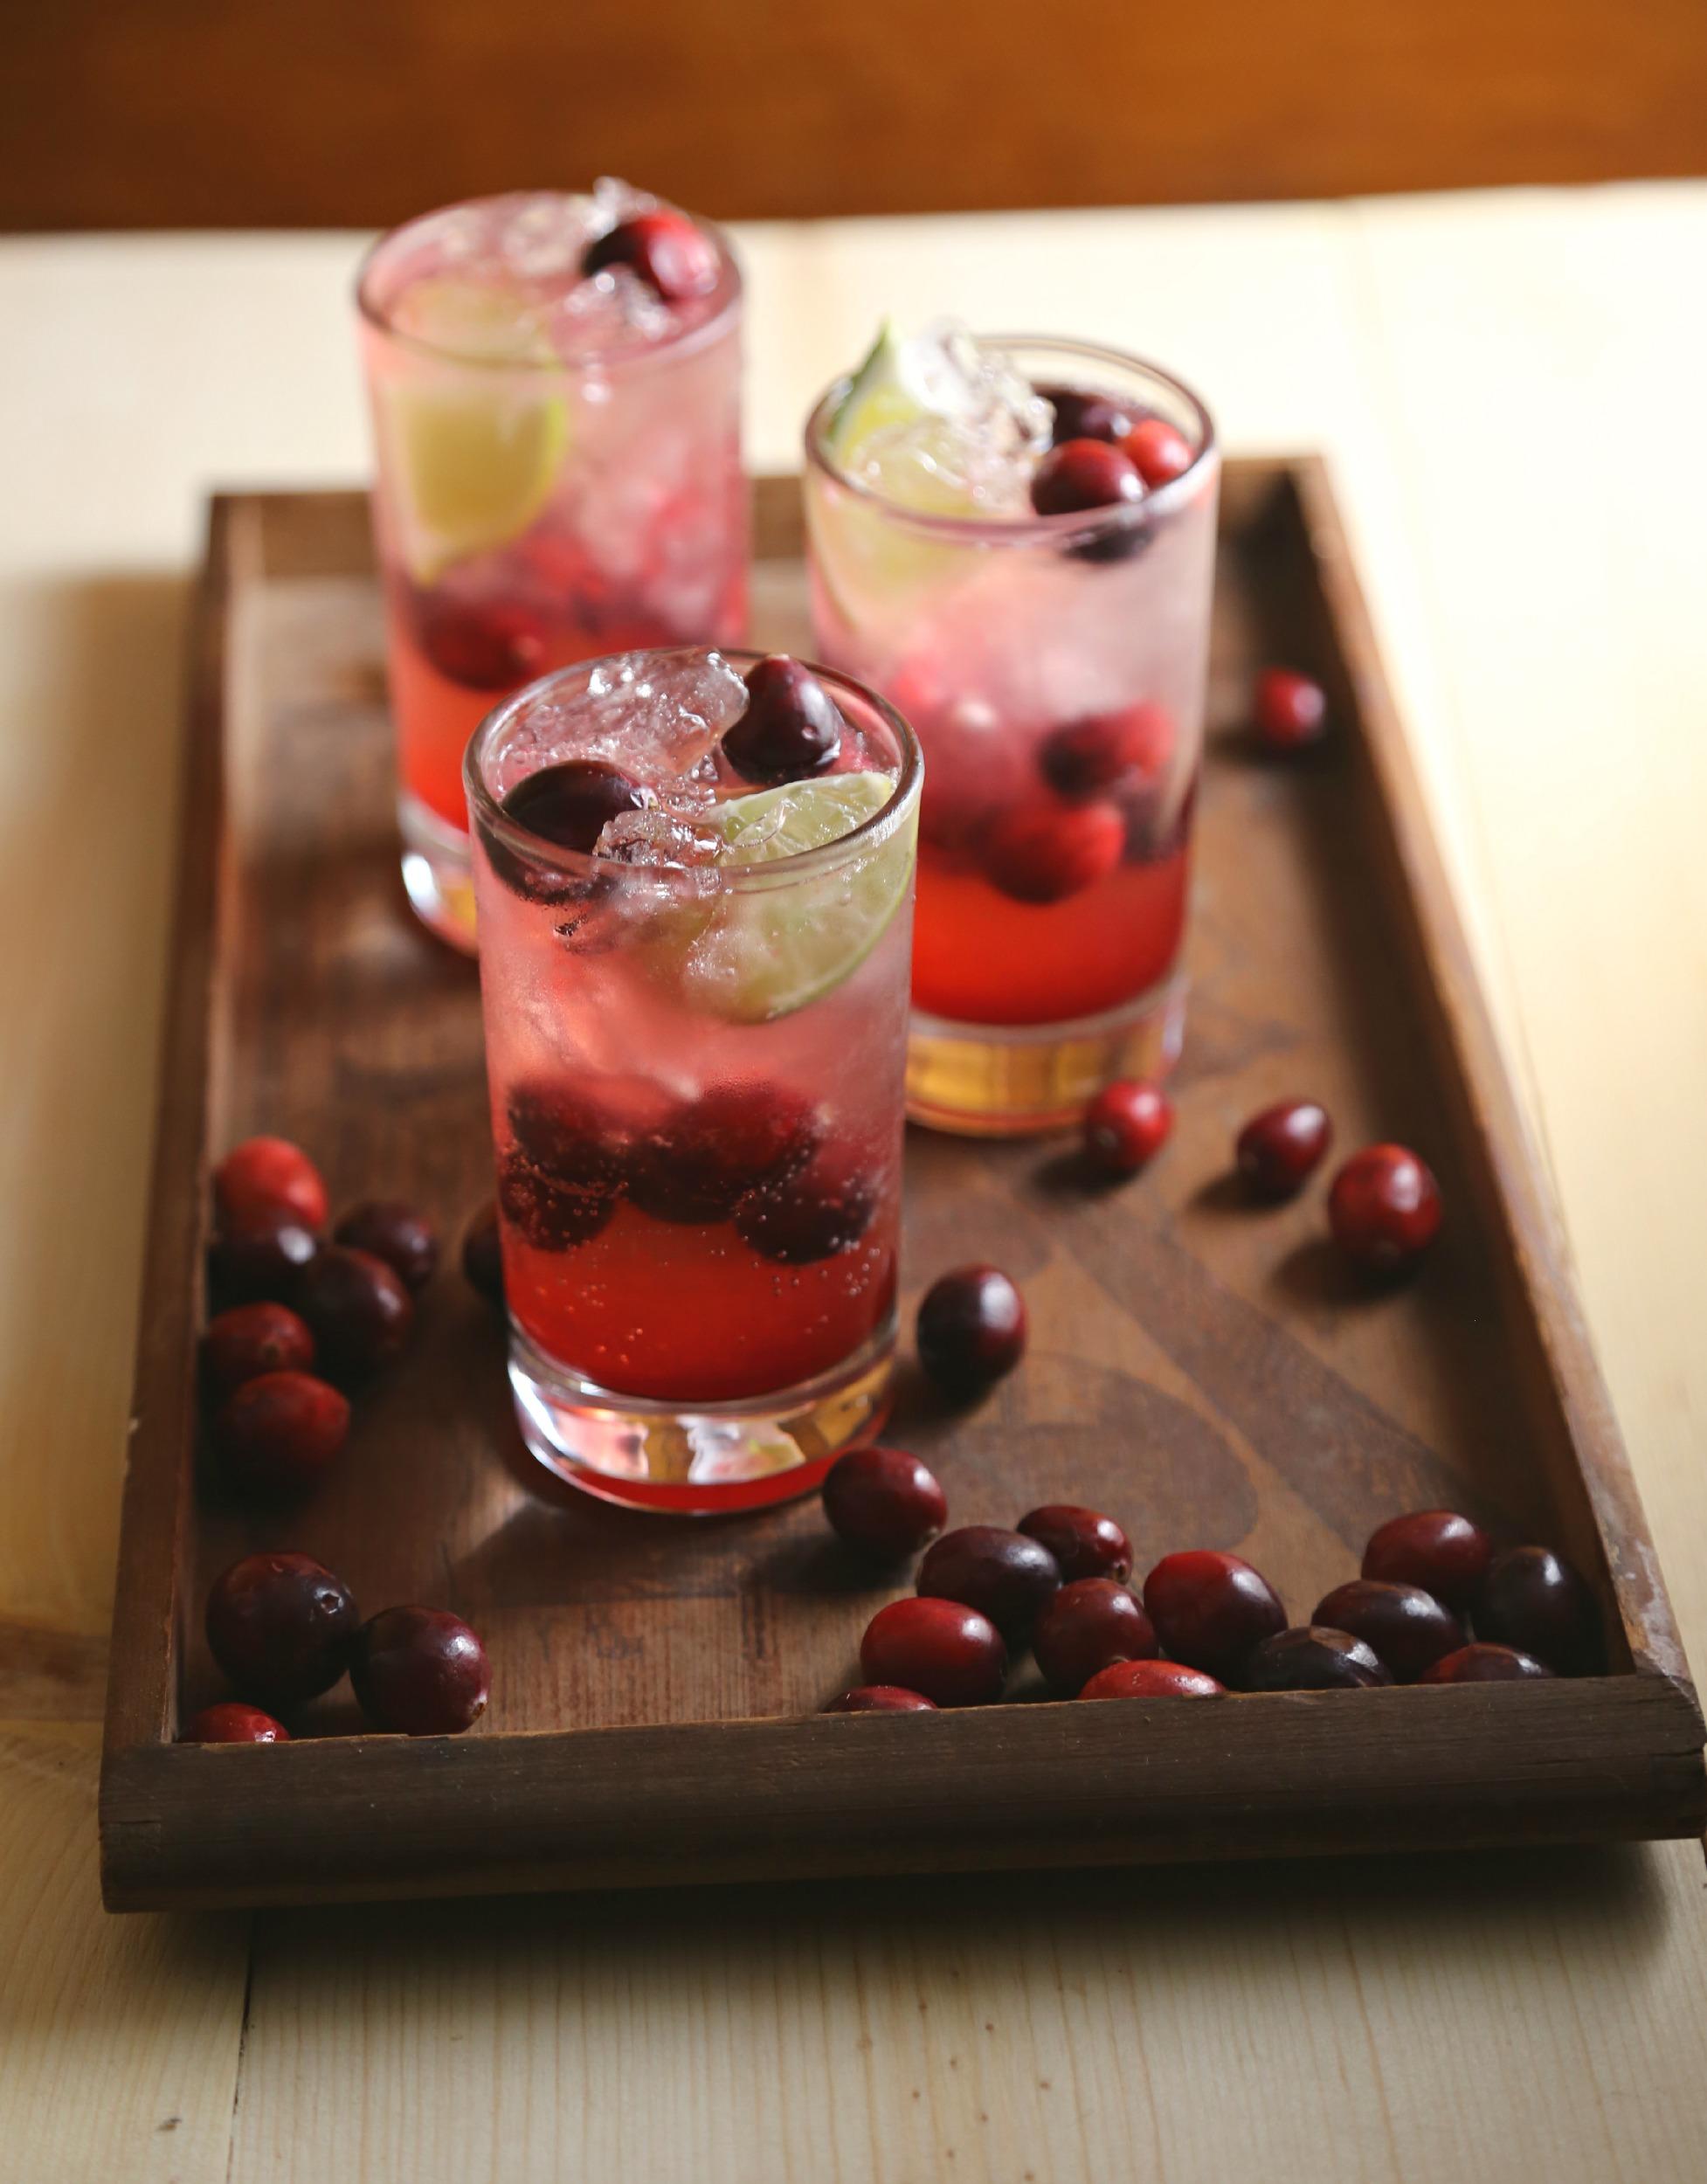 cranberry-pisco-chilcano-cocktail-vianneyrodriguez-sweetlifebake